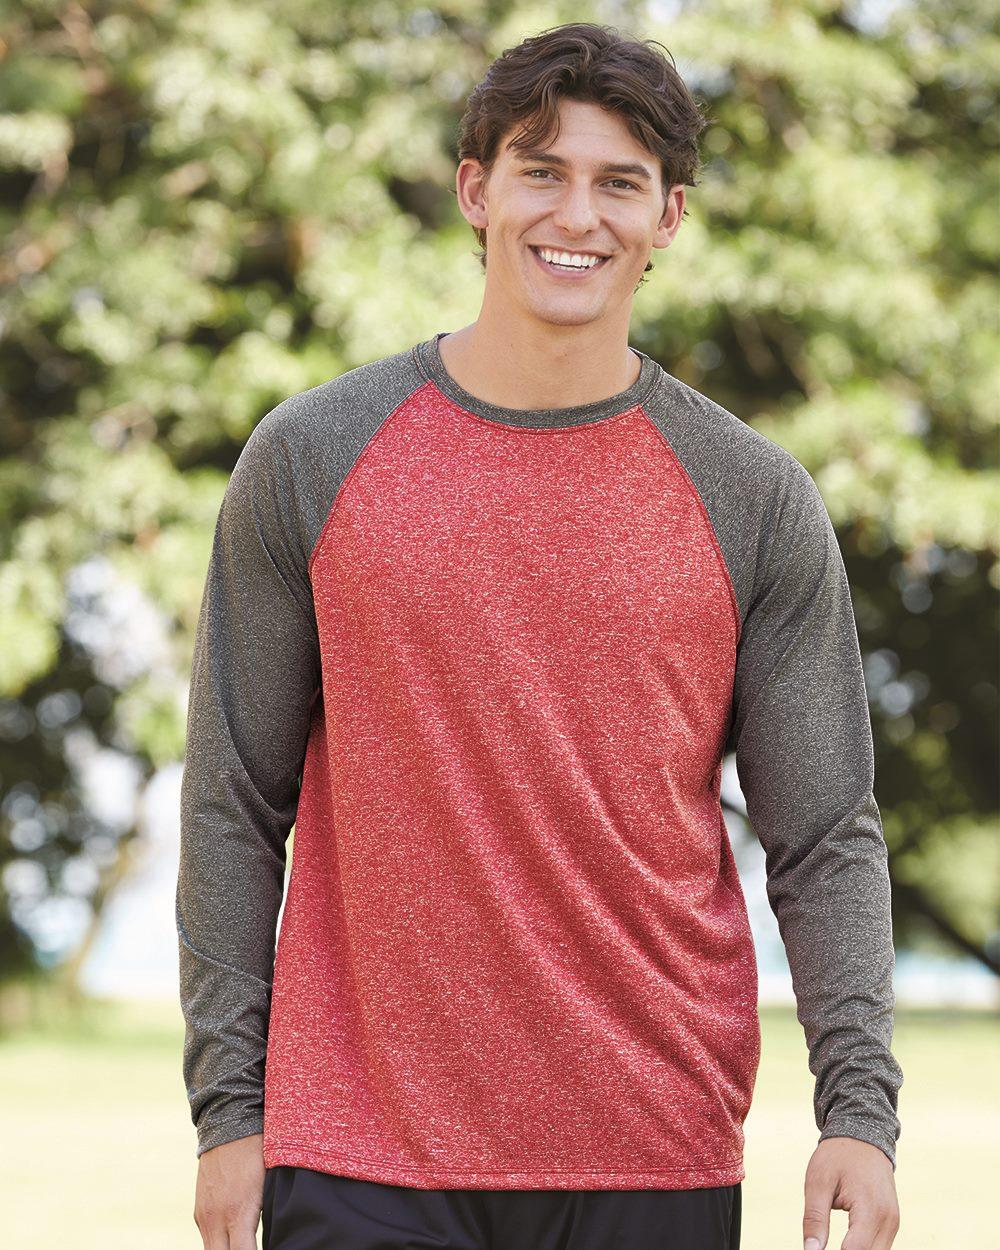 Augusta Sportswear 2815 - Kinergy Raglan Long Sleeve Tee